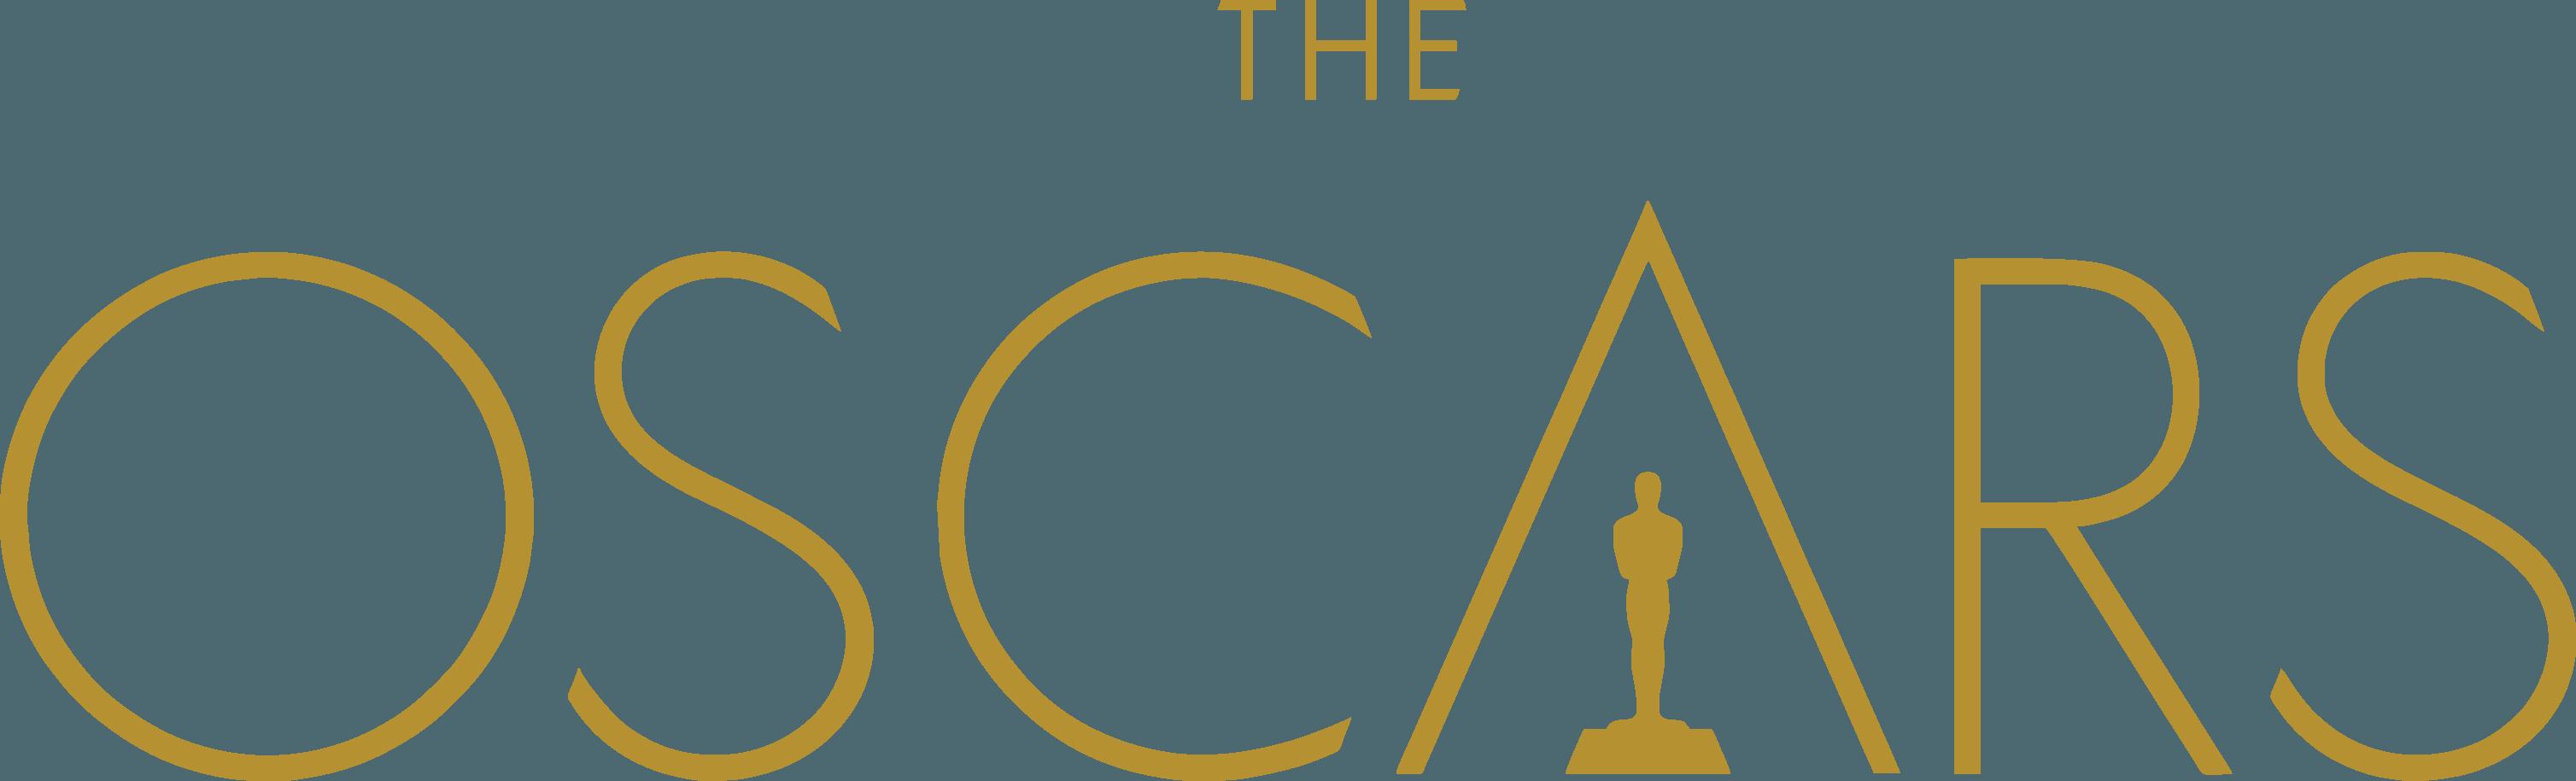 Oscar Logo (Academy Awards) png